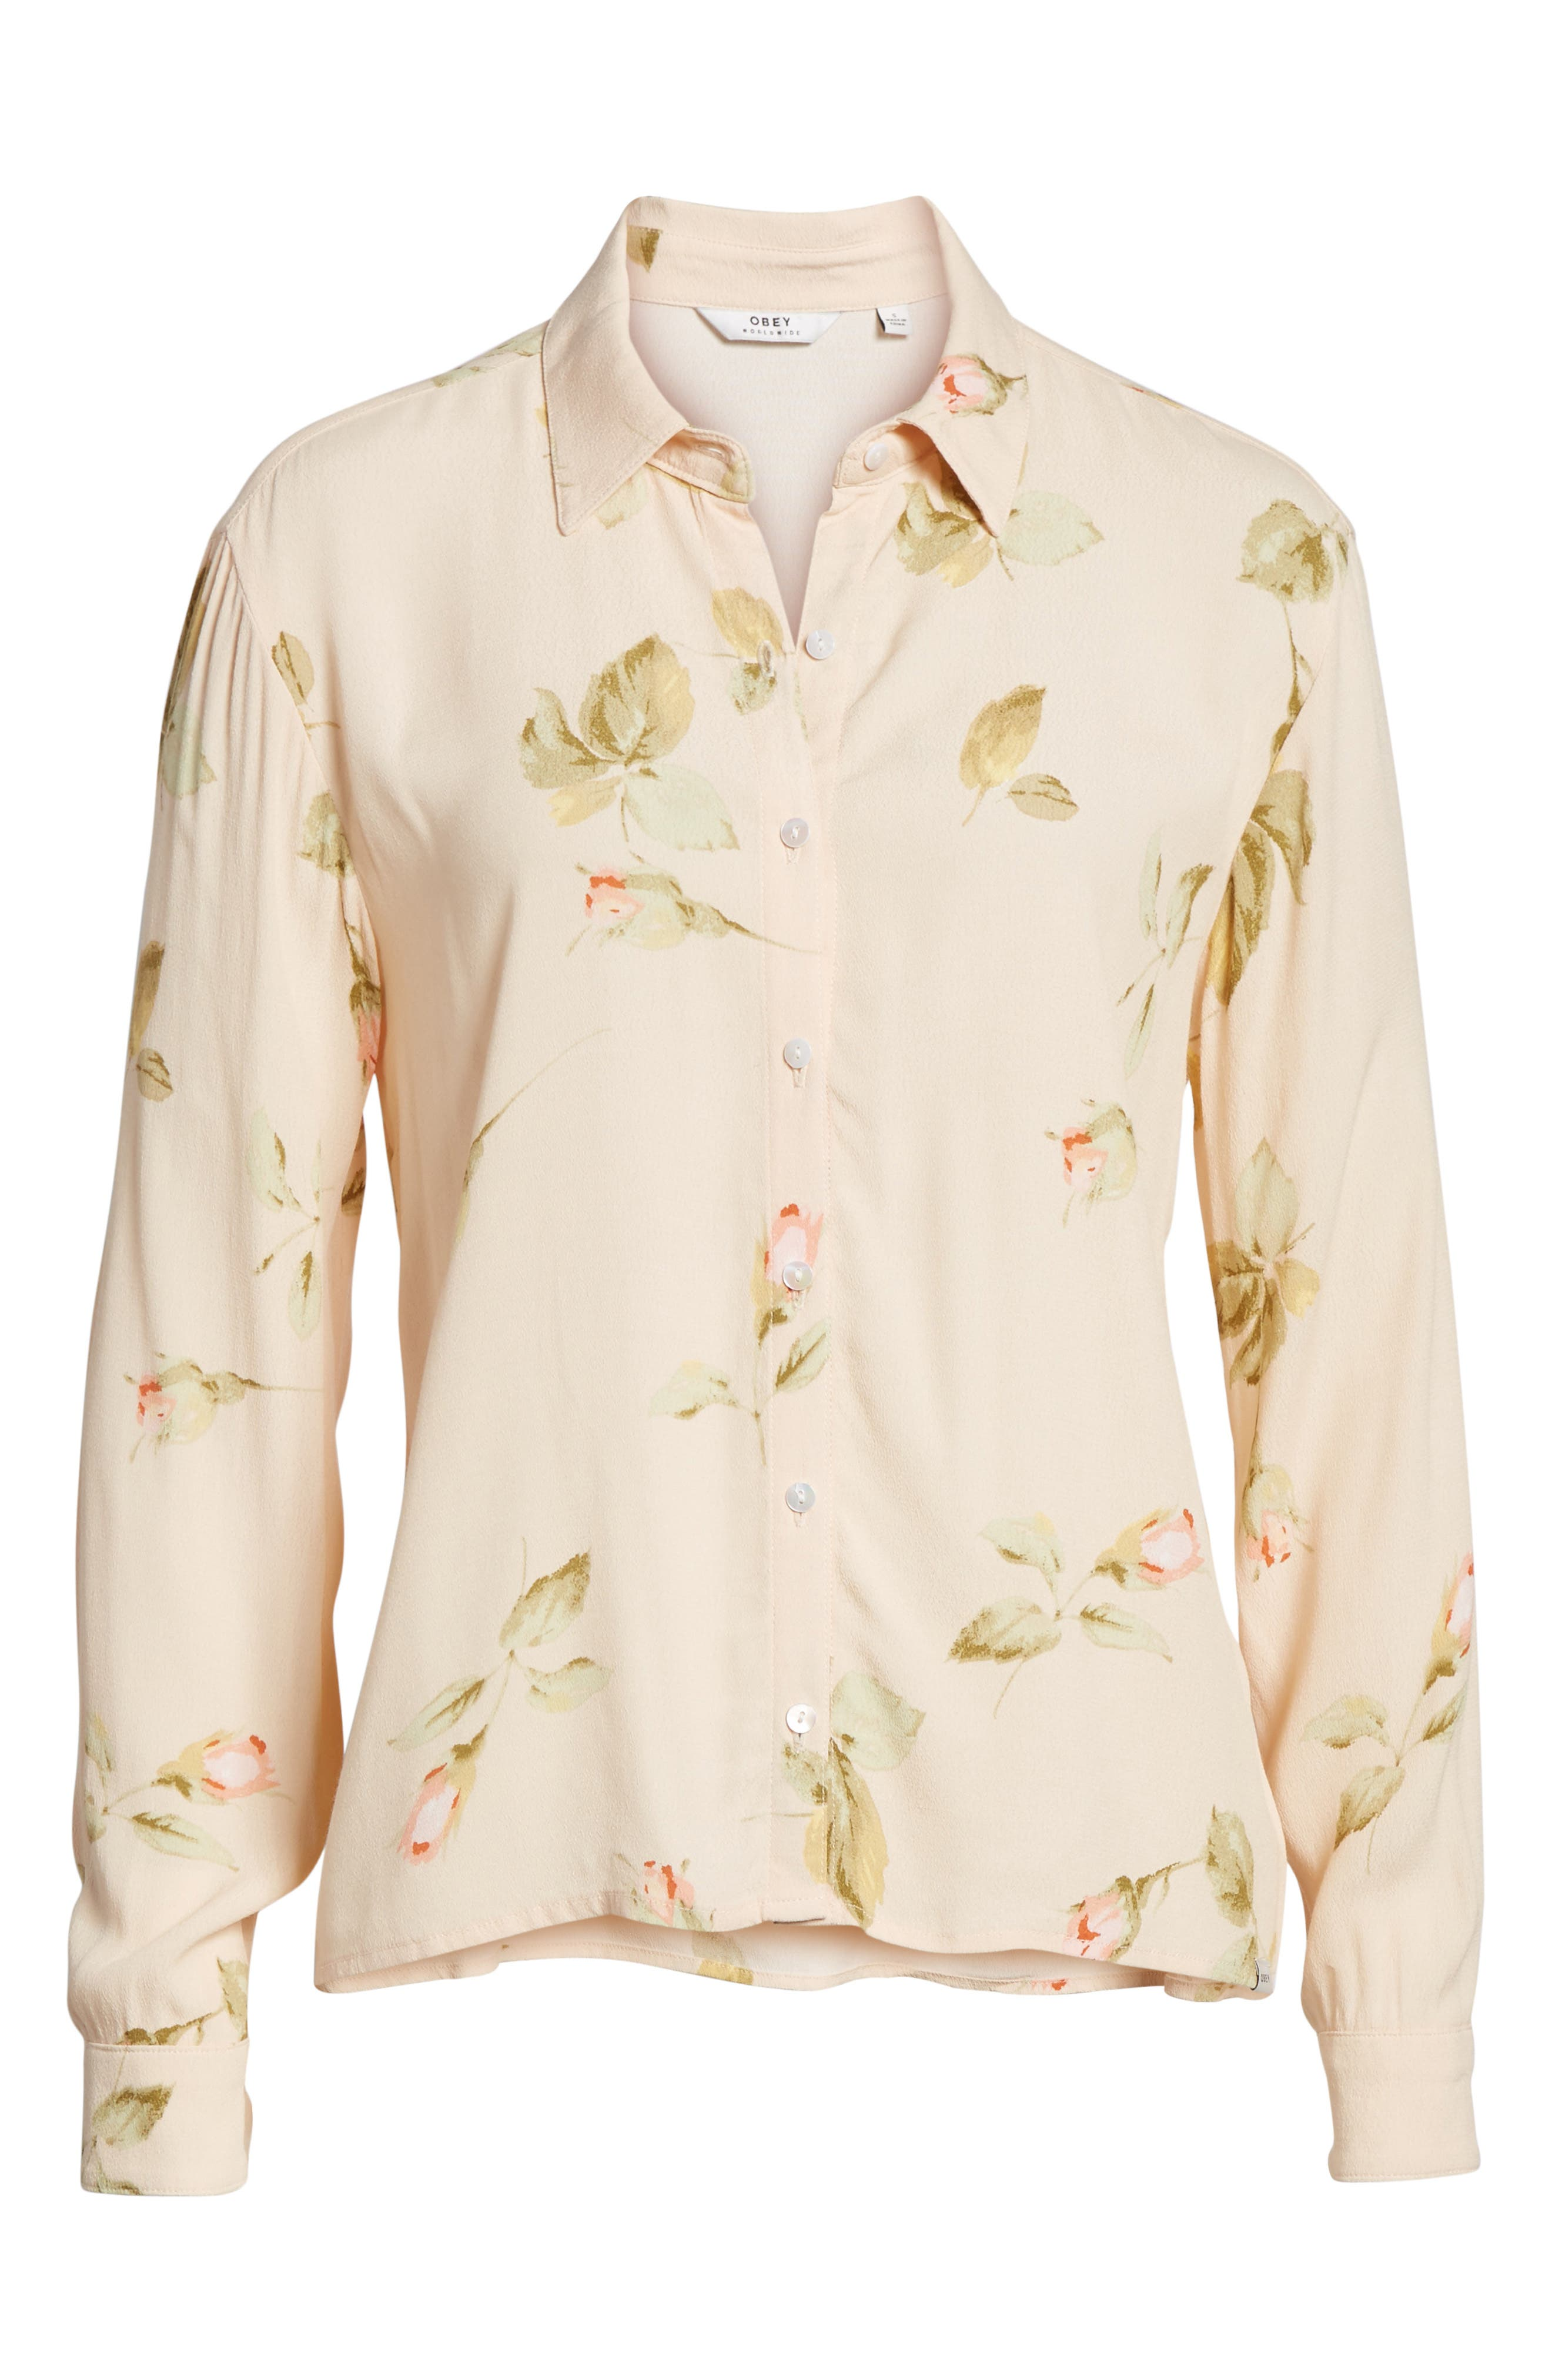 Sinclair Floral Print Shirt,                             Alternate thumbnail 6, color,                             Taupe Multi